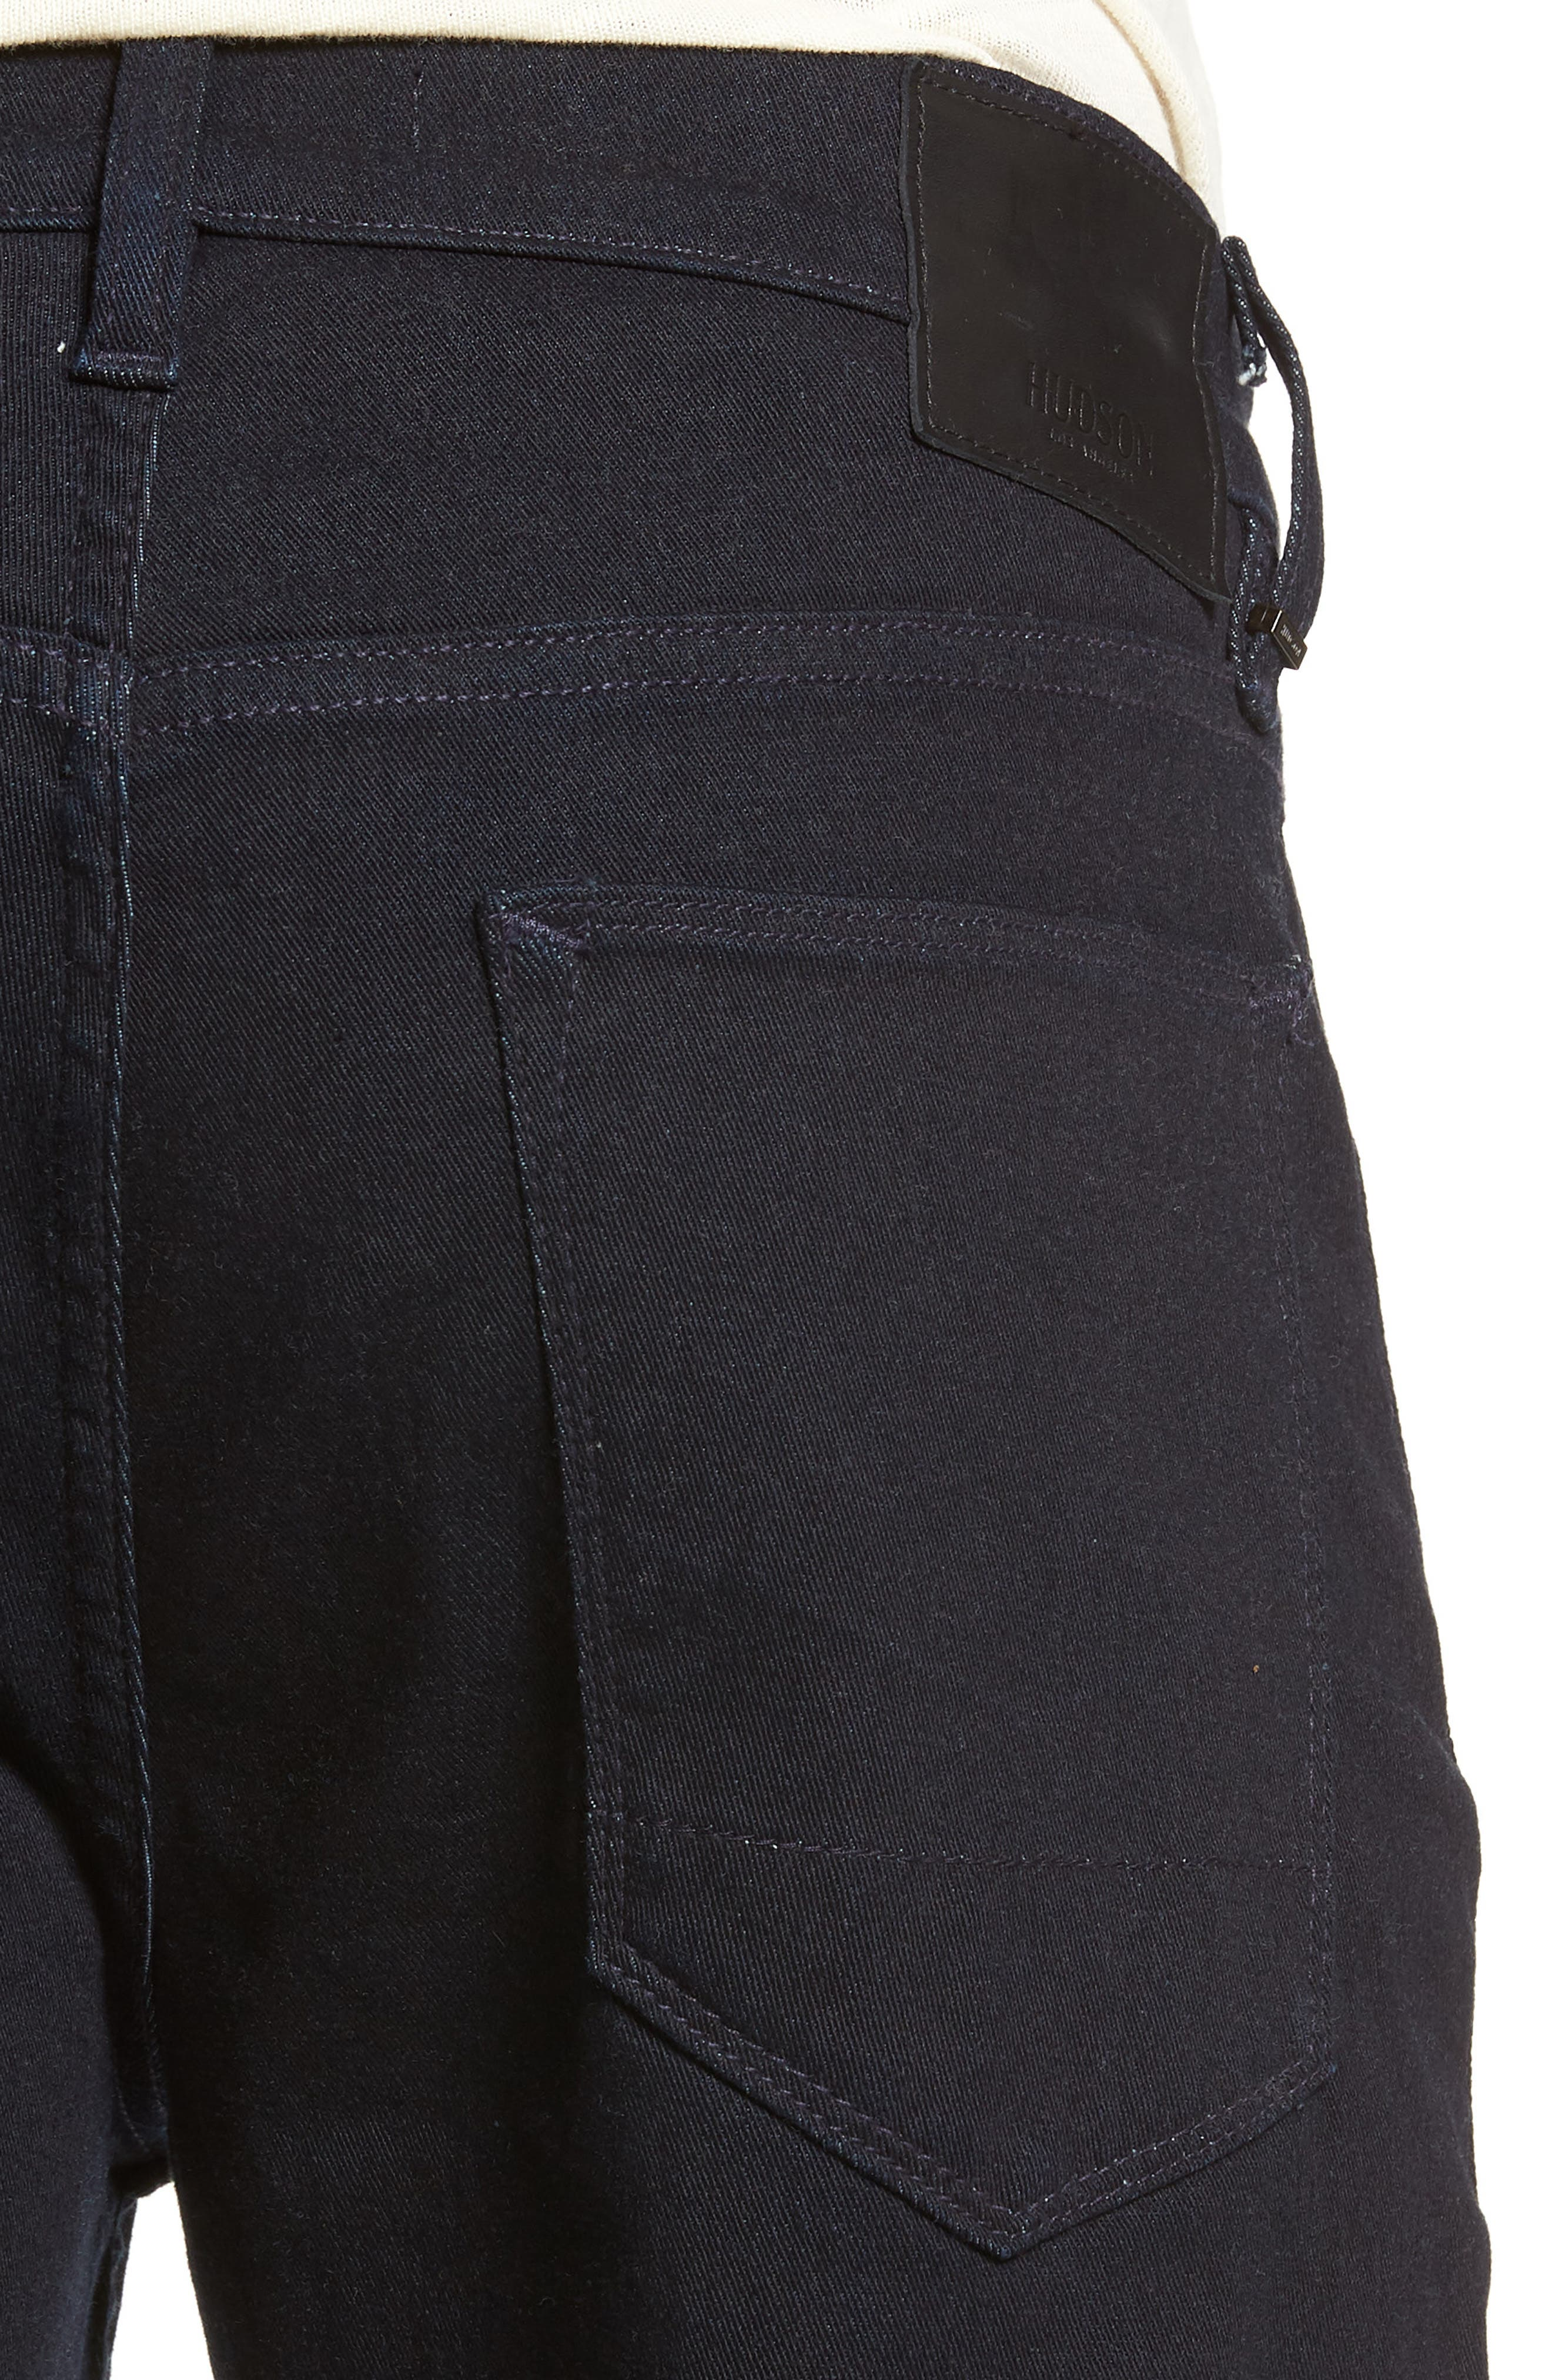 Blake Slim Fit Straight Leg Jeans,                             Alternate thumbnail 4, color,                             WILLIAMS